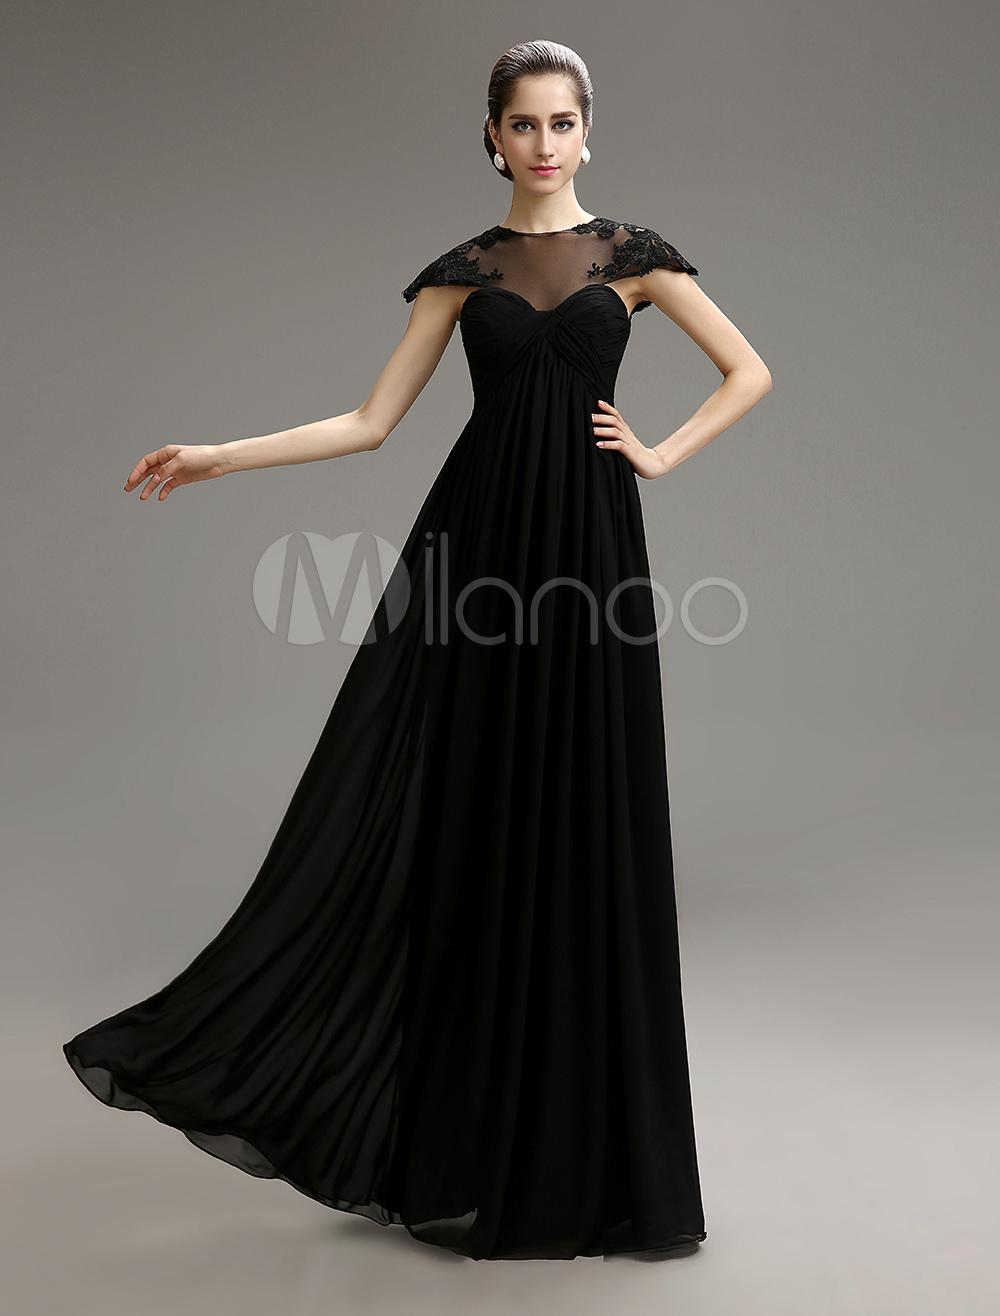 Black Jewel Neck Chiffon Evening Dress with Sheer Lace Milanoo (Wedding Evening Dresses) photo